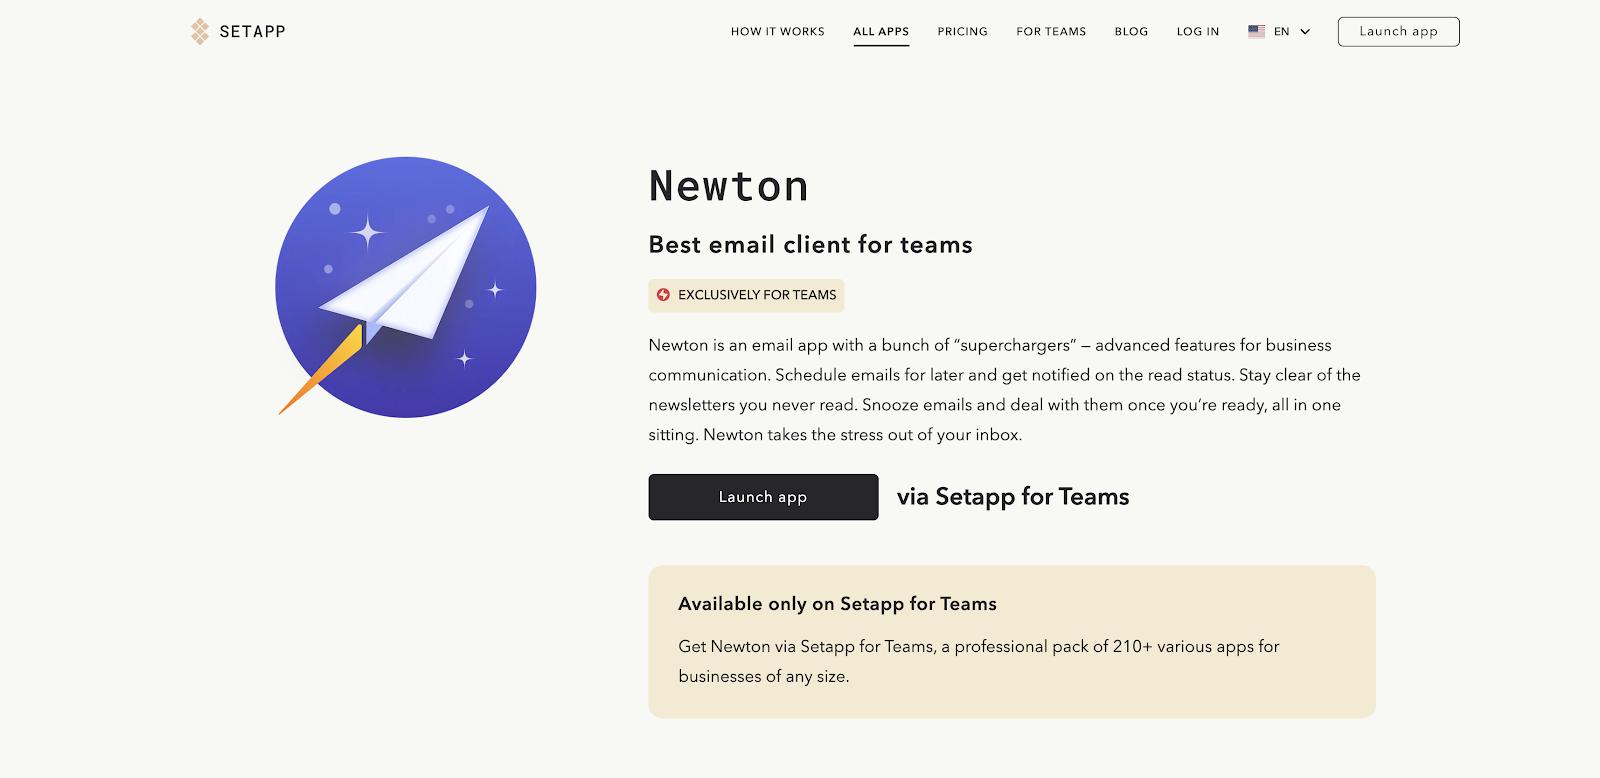 Exclusive apps Setapp for Teams